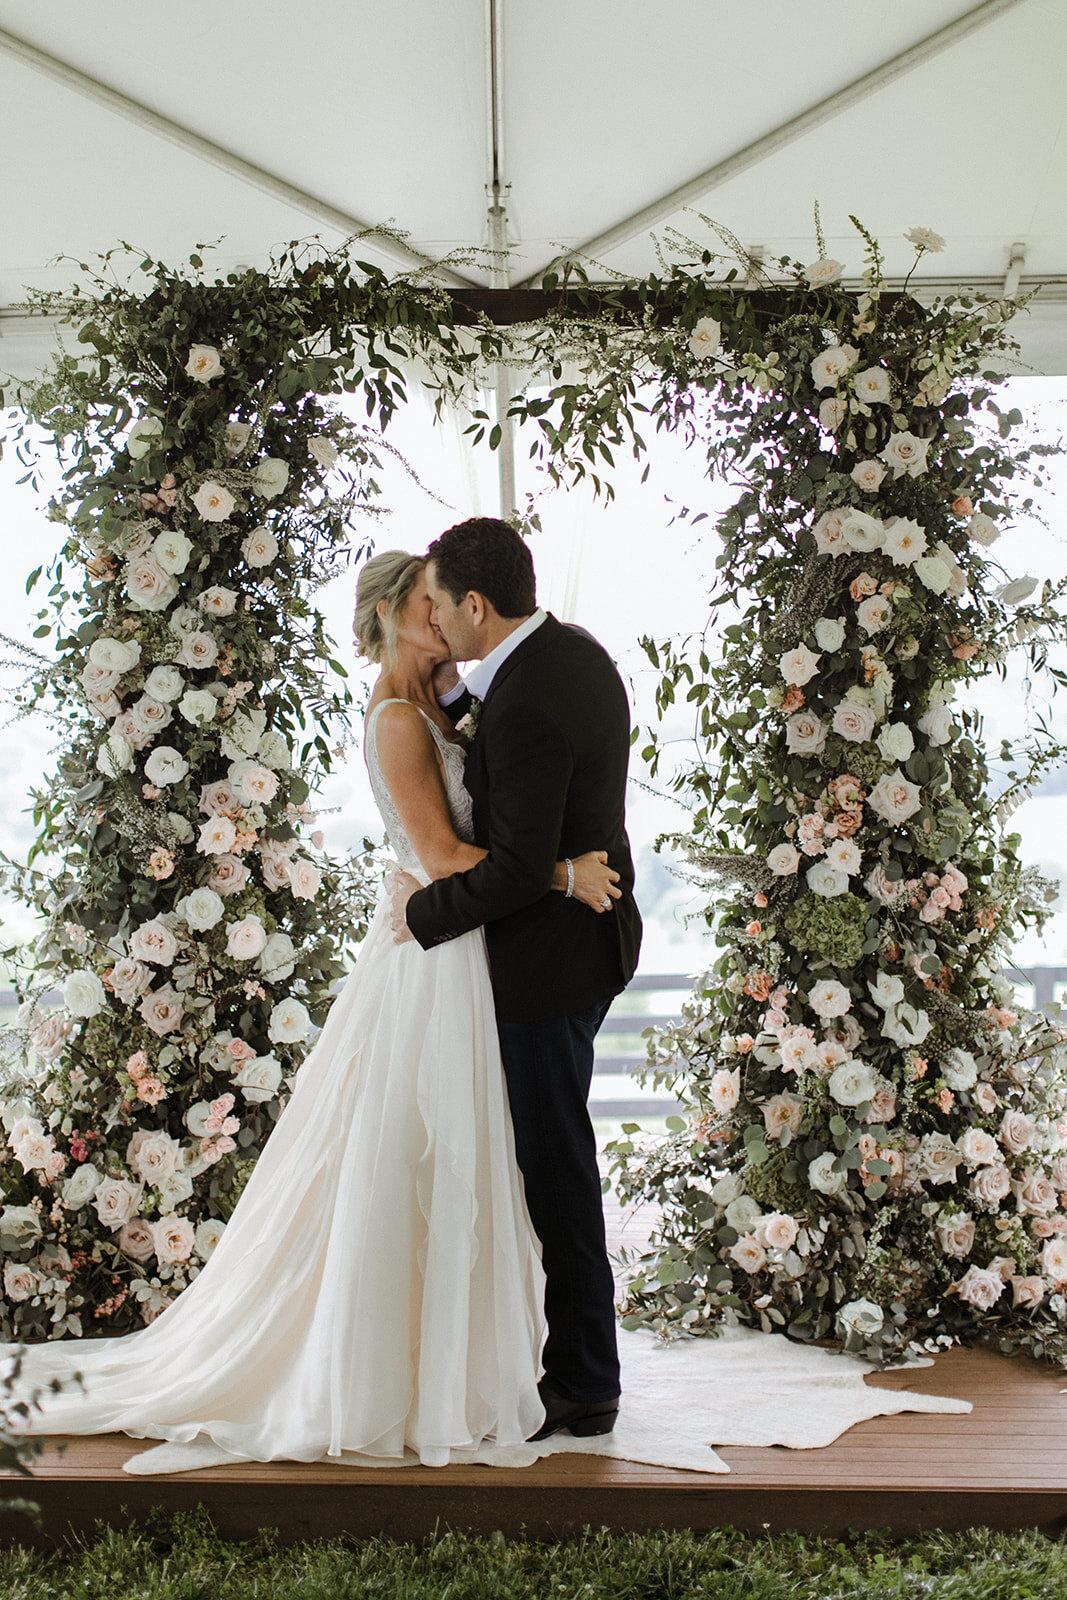 christi_john_wedding_1-1336_websize.jpg